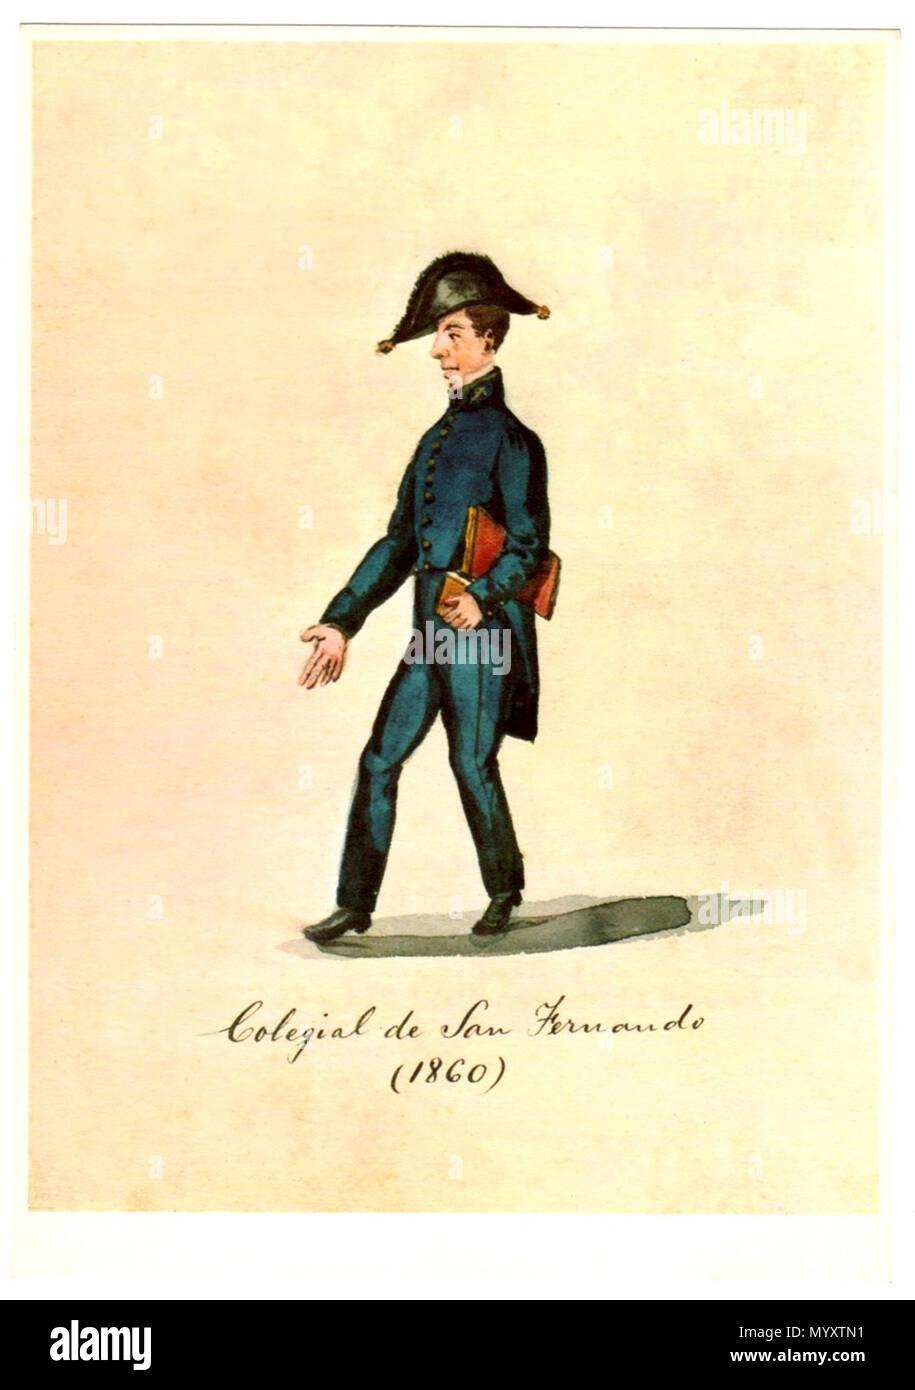 . Español: Acuarela de Pancho Fierro (Lima, 1807 - Lima, 1879) . 1860. Pancho Fierro 23 Colegial de San Fernando (1860) Imagen De Stock